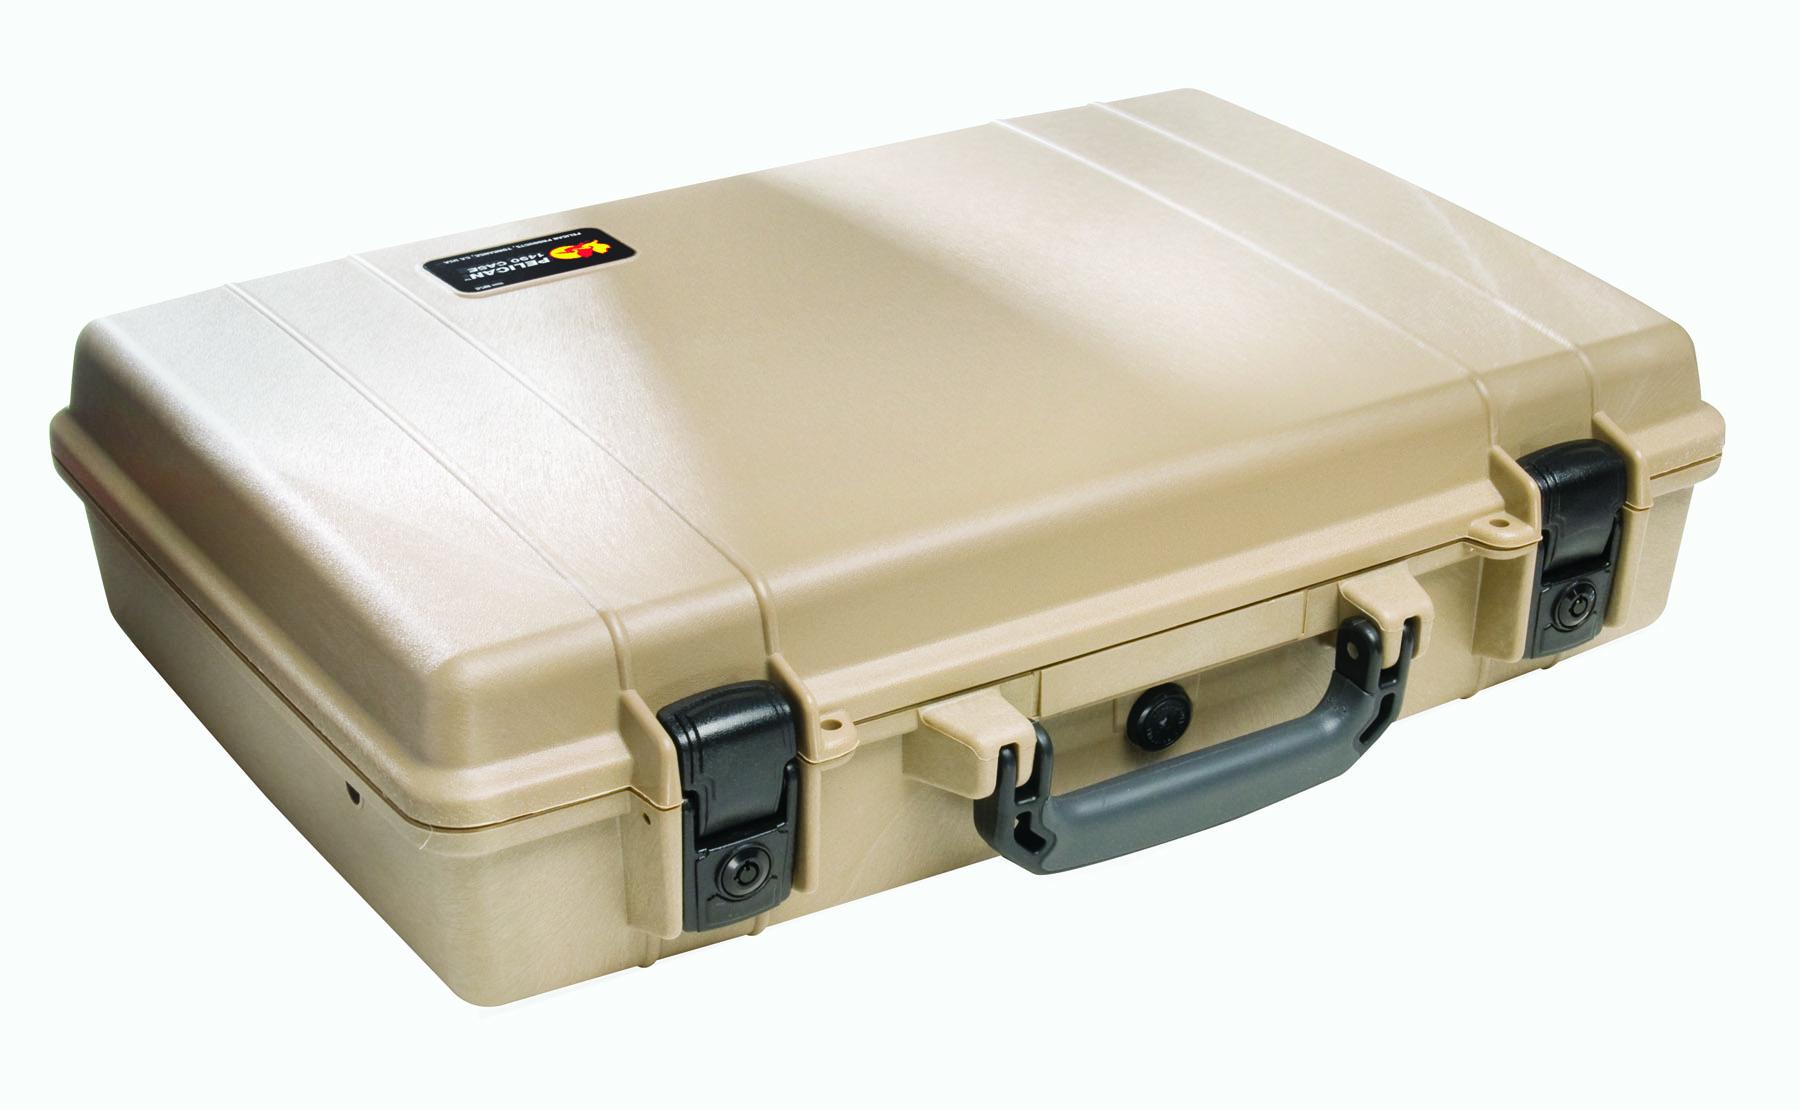 1490CC1 - Pelican 1490cc1 Pelican Laptop Case